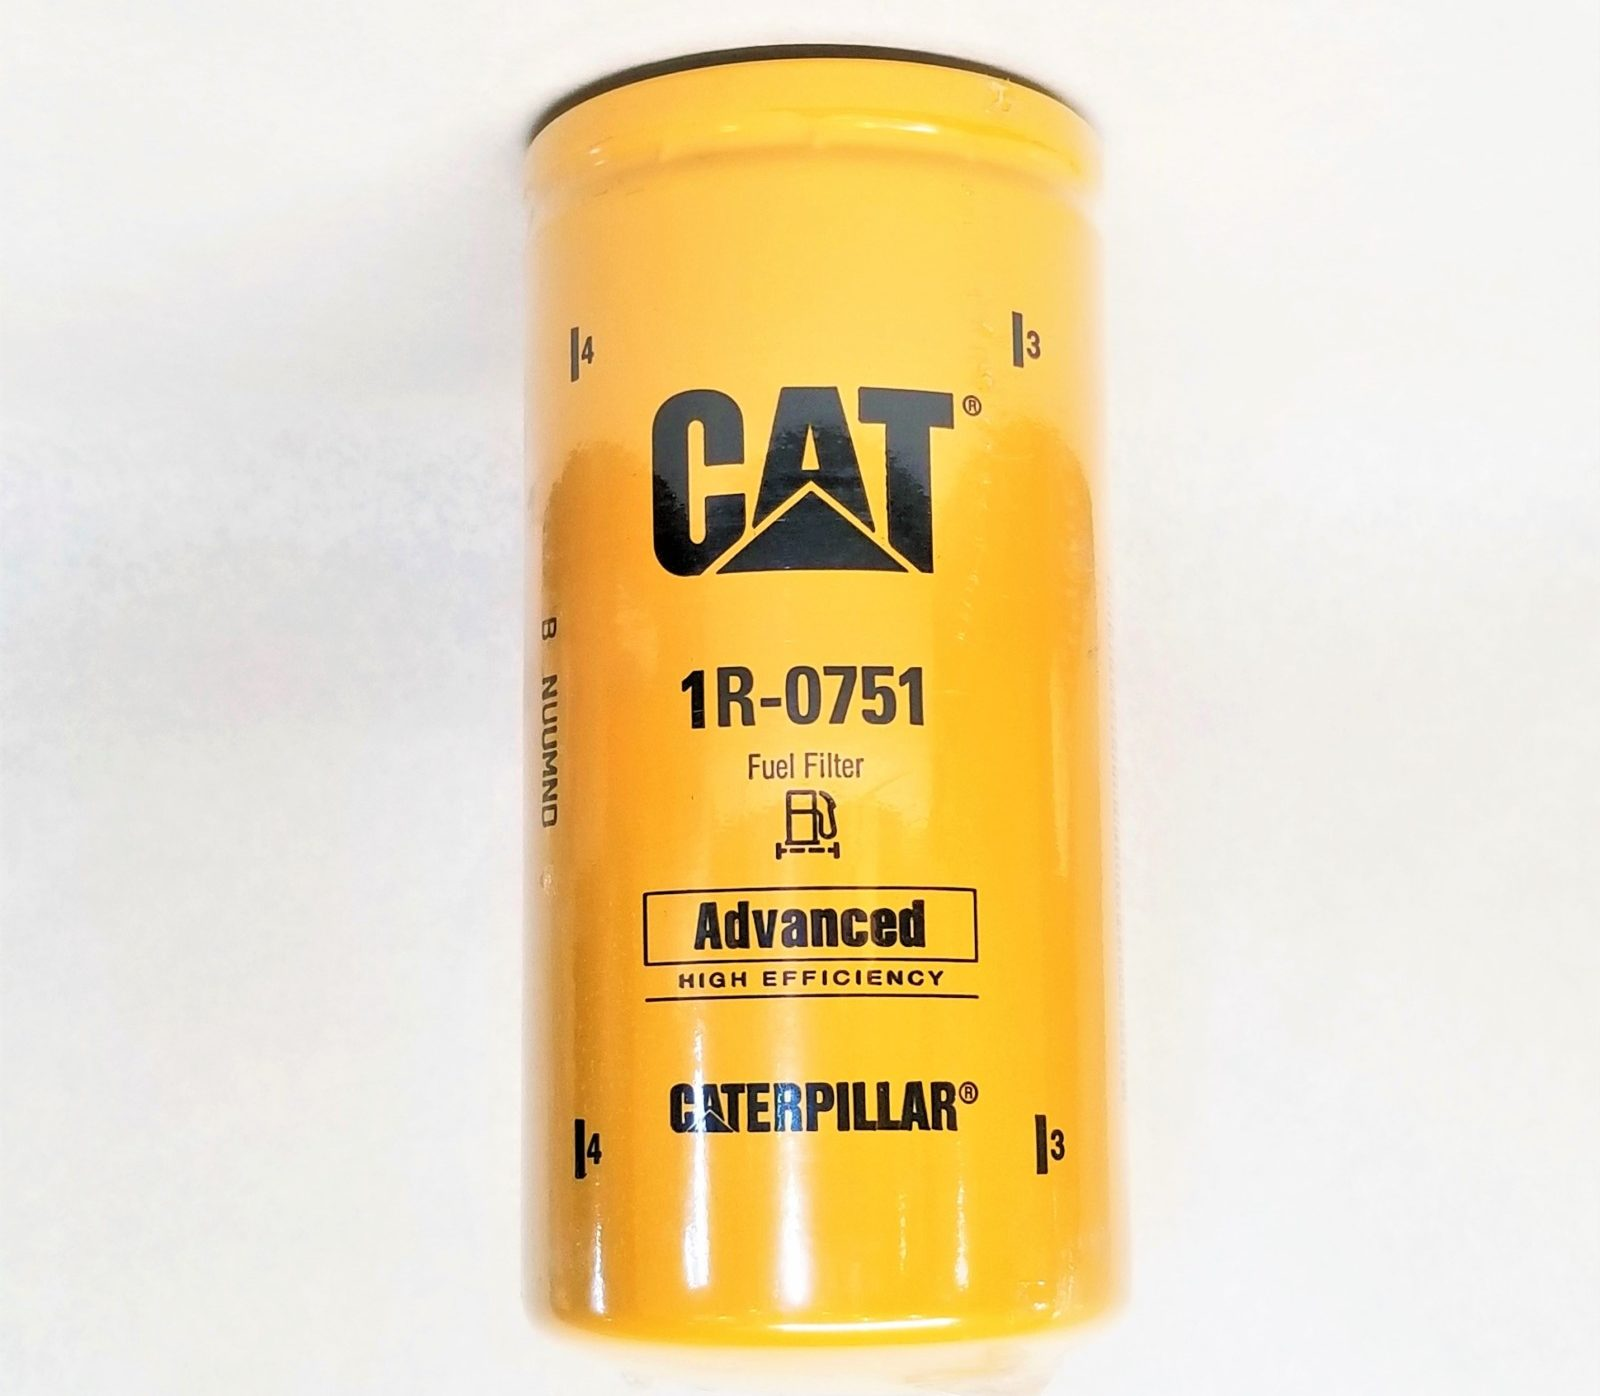 Caterpillar CAT 1R-0751 Fuel Filter ...